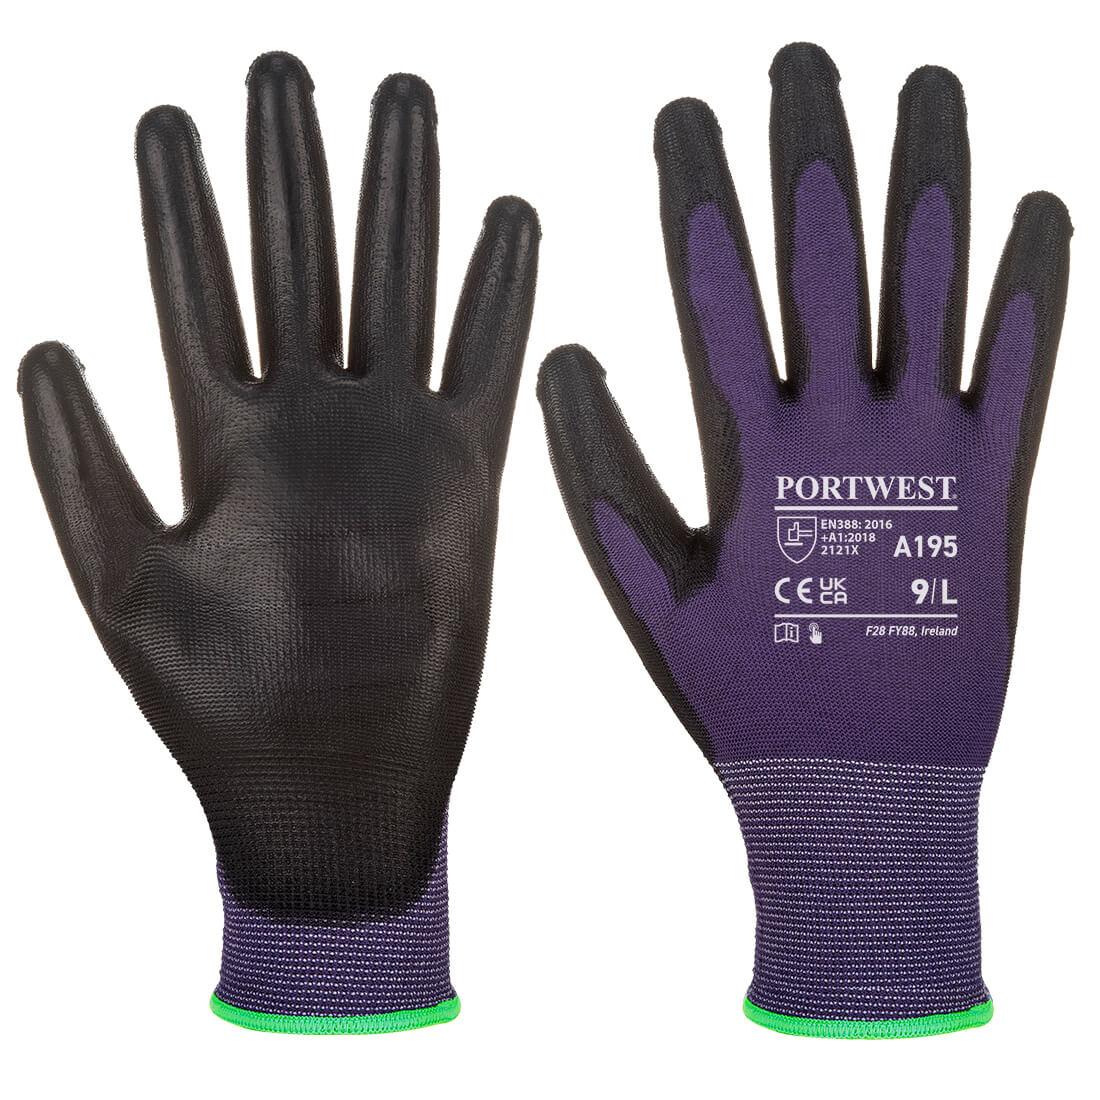 HAND PROTECTION, General Handling Gloves